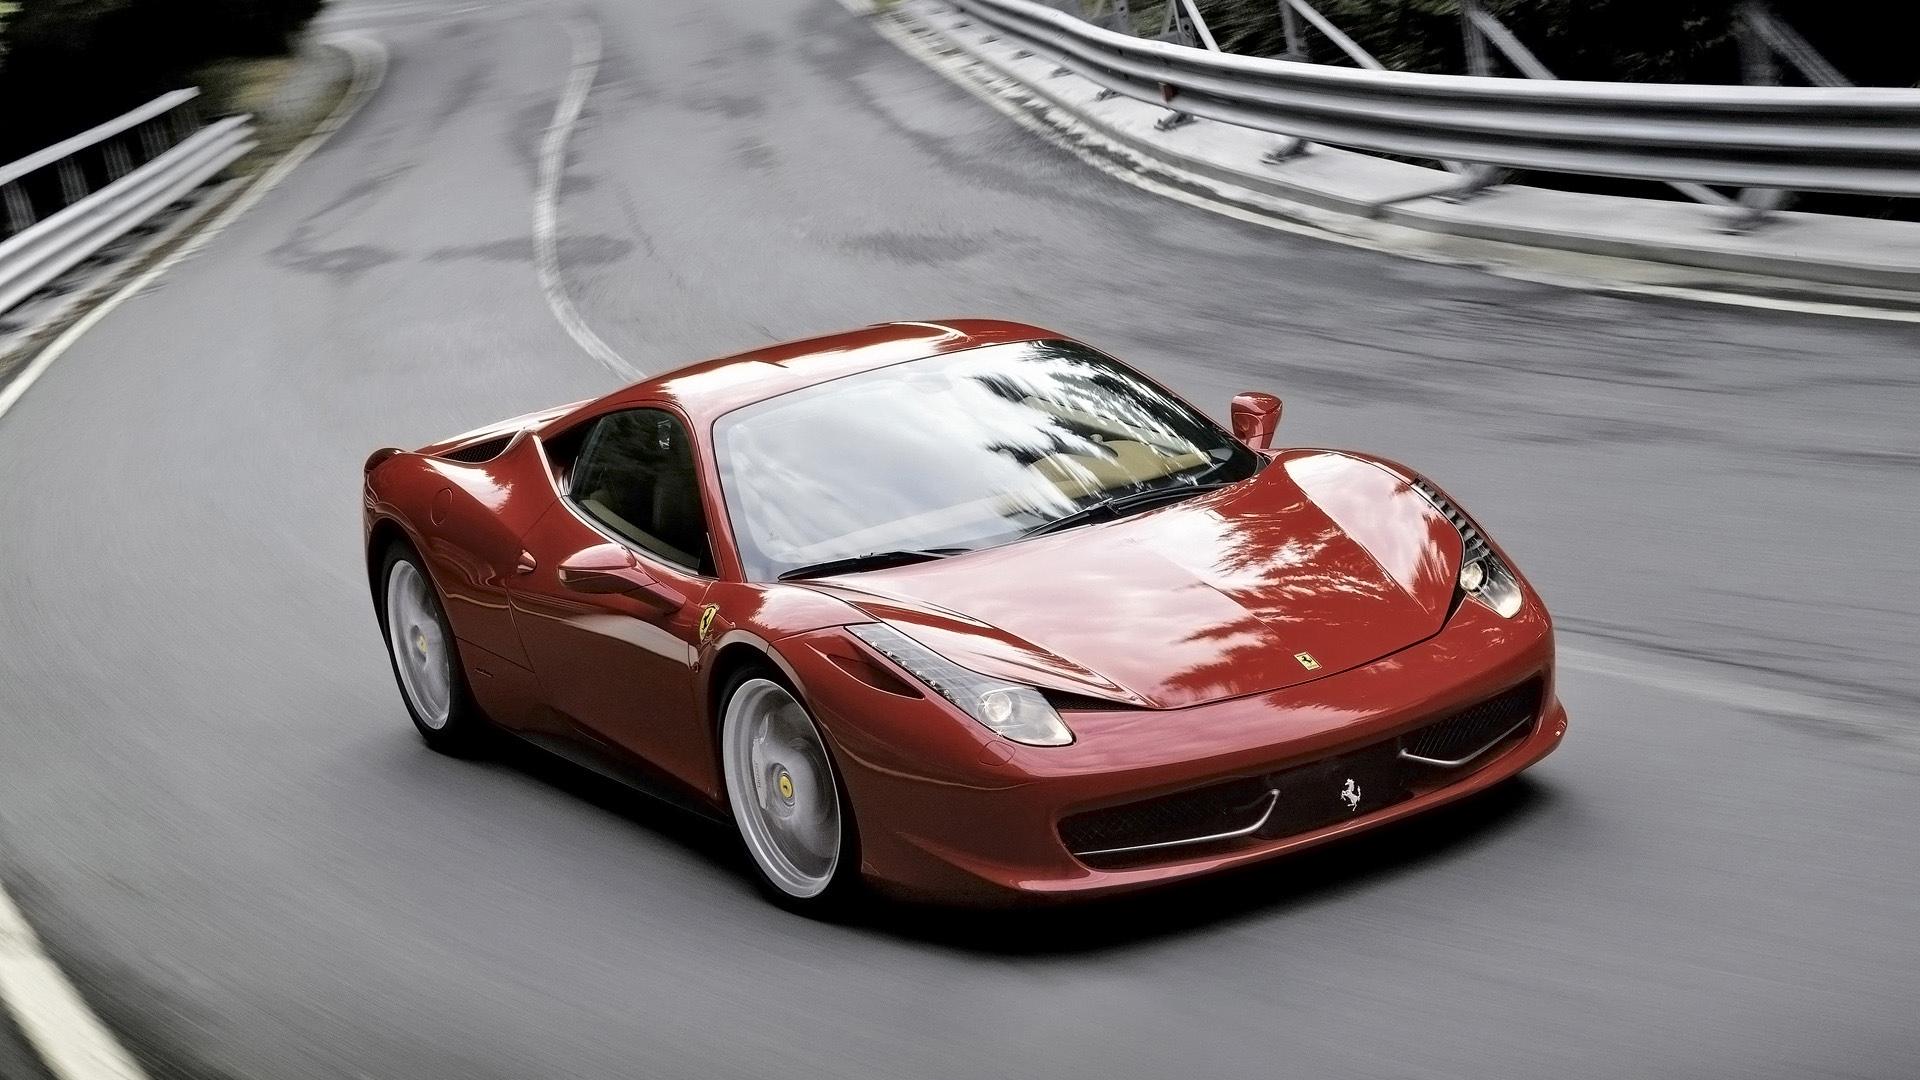 http://4.bp.blogspot.com/-N45jYSfEfAA/UCi6OvufMsI/AAAAAAAAGoM/49IJbW2QU3A/s0/2011-ferrari-458-italia-red-speed-1920x1080-wallpaper.jpg